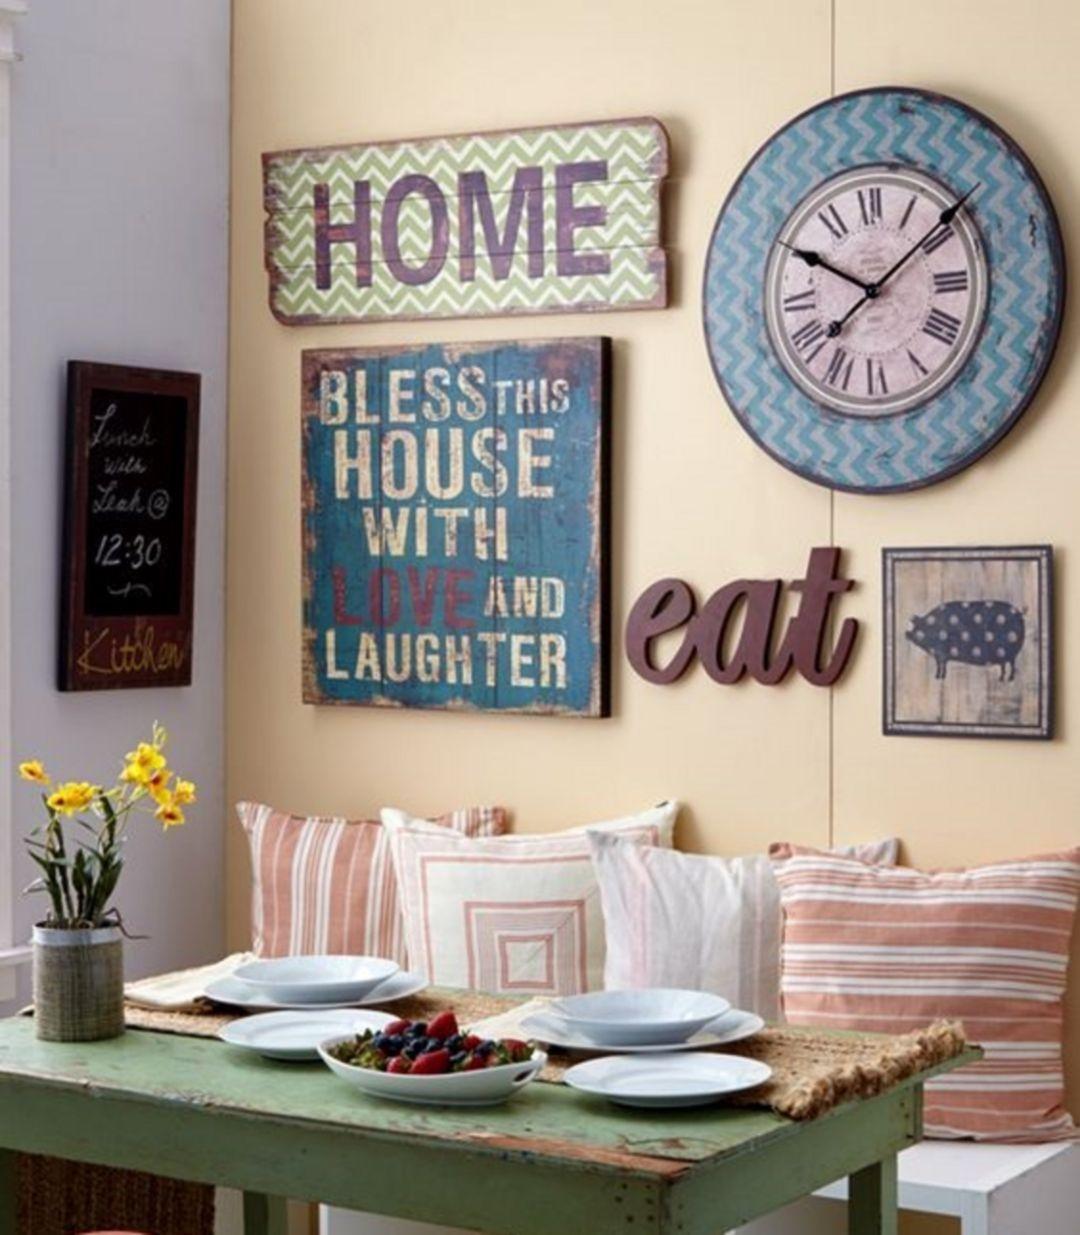 20 unique kitchen decorating ideas for cooking convenience kitchen decor themes kitchen wall on kitchen ideas unique id=48134